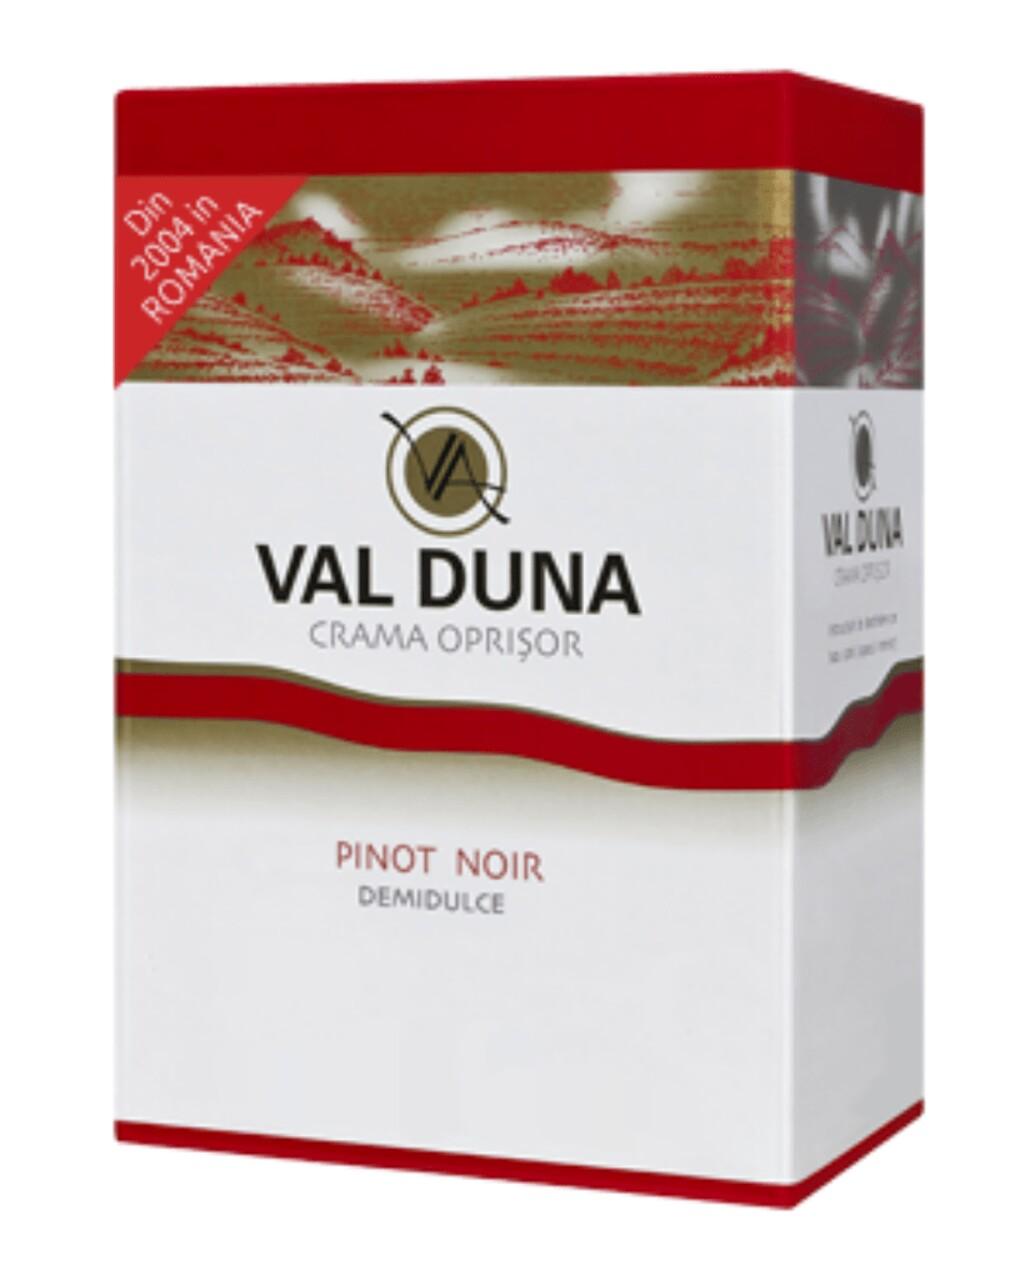 Oprisor Val Duna Pinot Noir BIB 3L